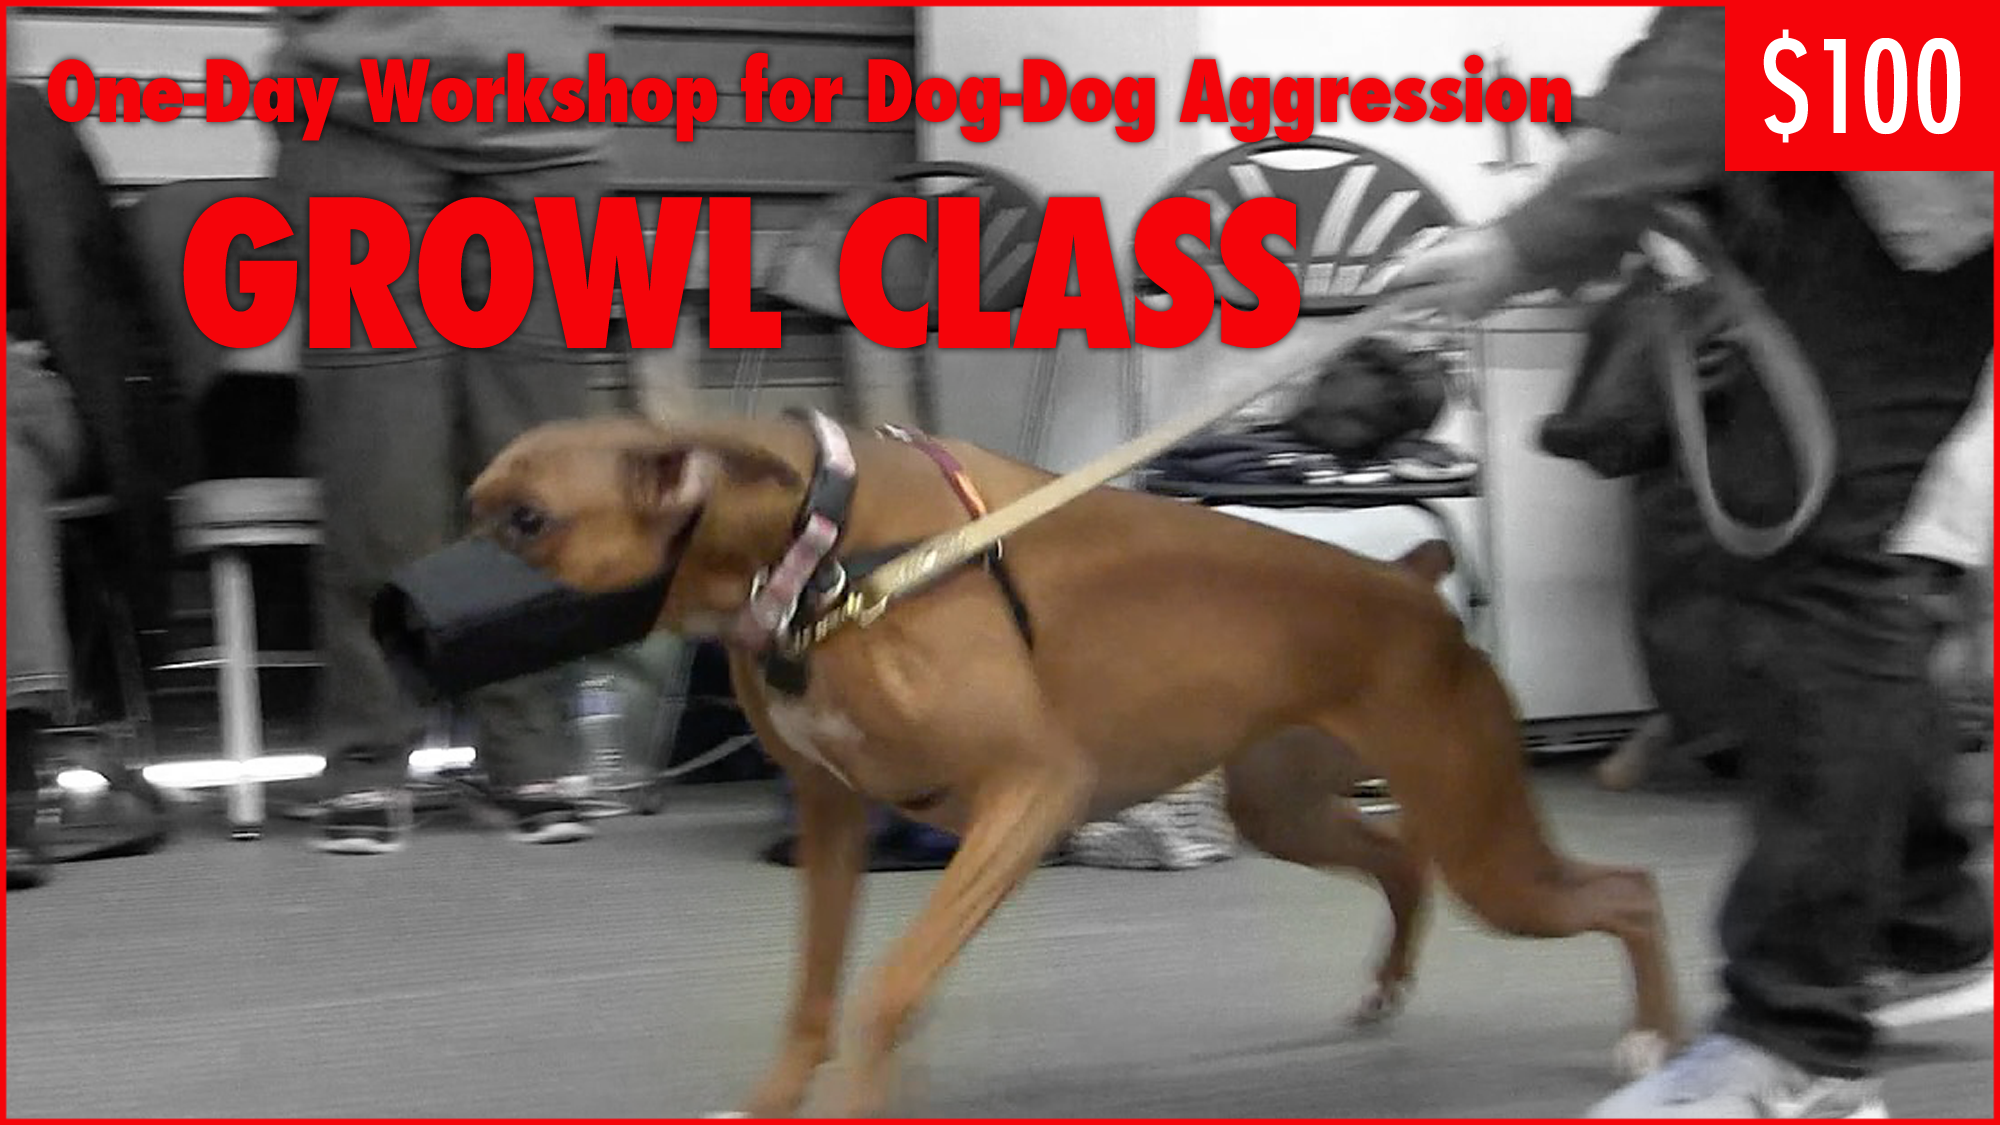 Growl_Class_Workshop.png